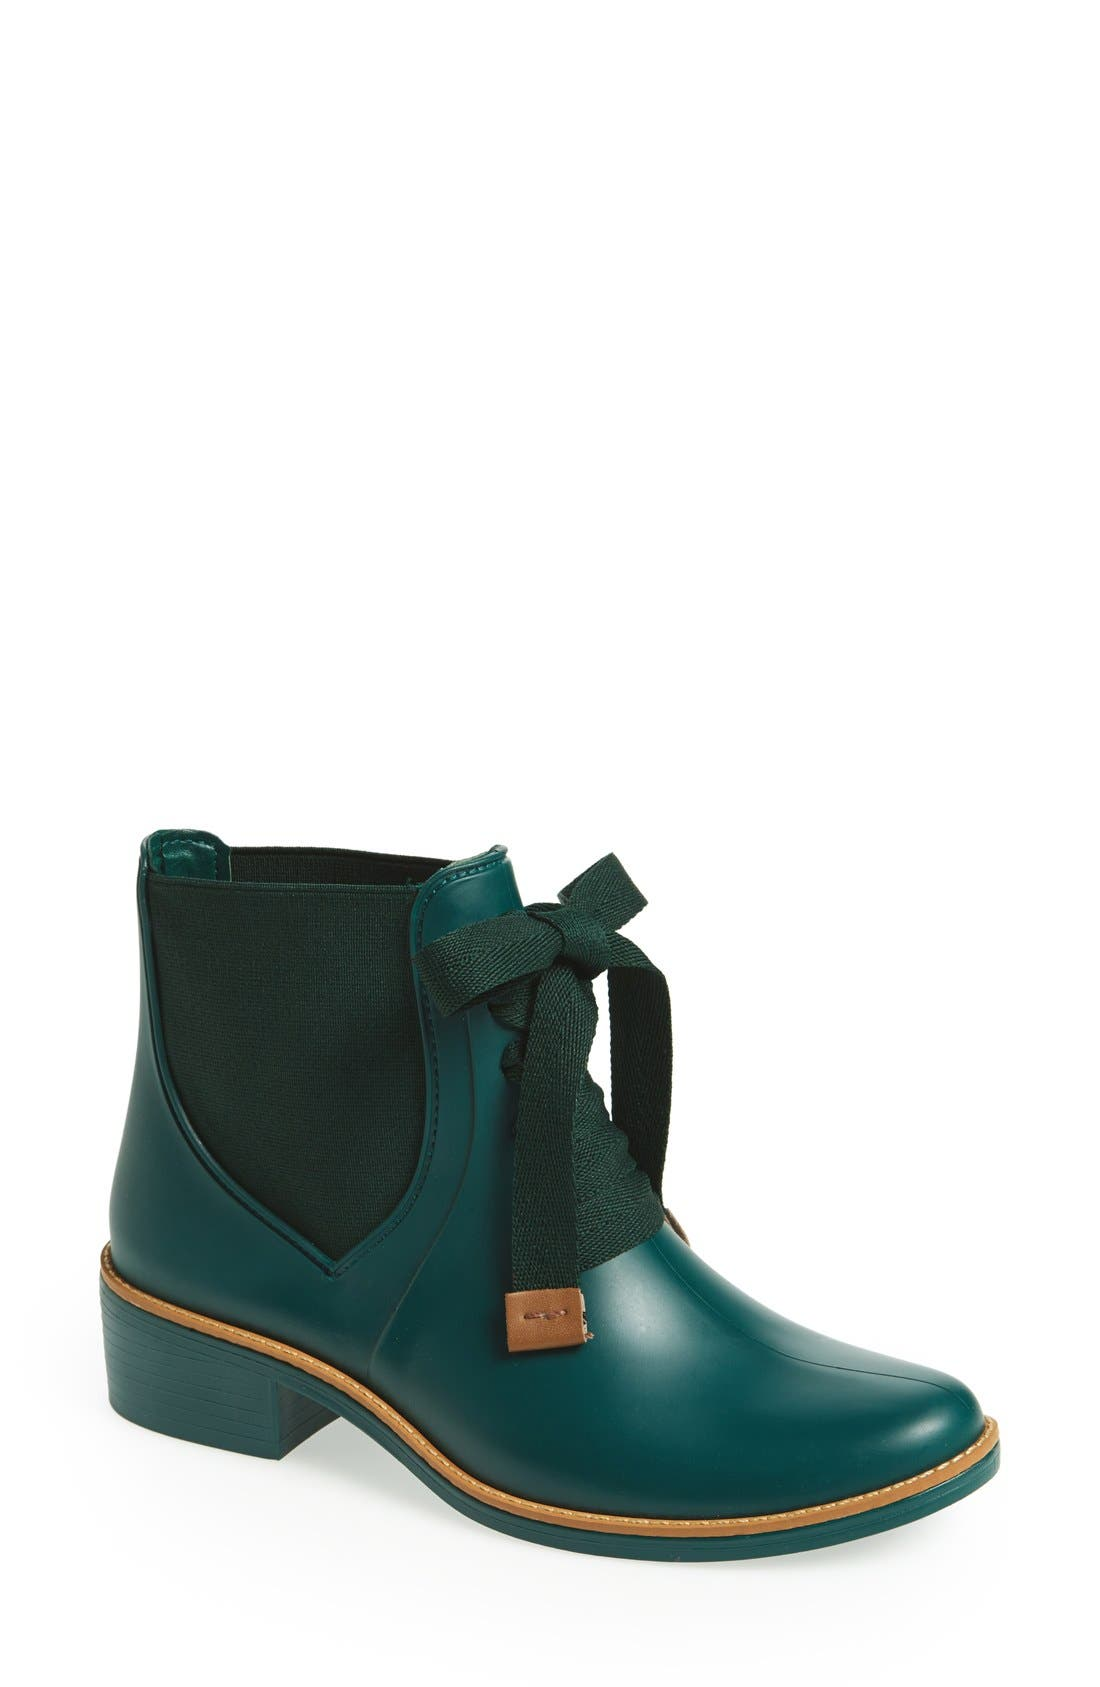 Alternate Image 1 Selected - Bernardo Lacey Short Waterproof Rain Boot (Women)